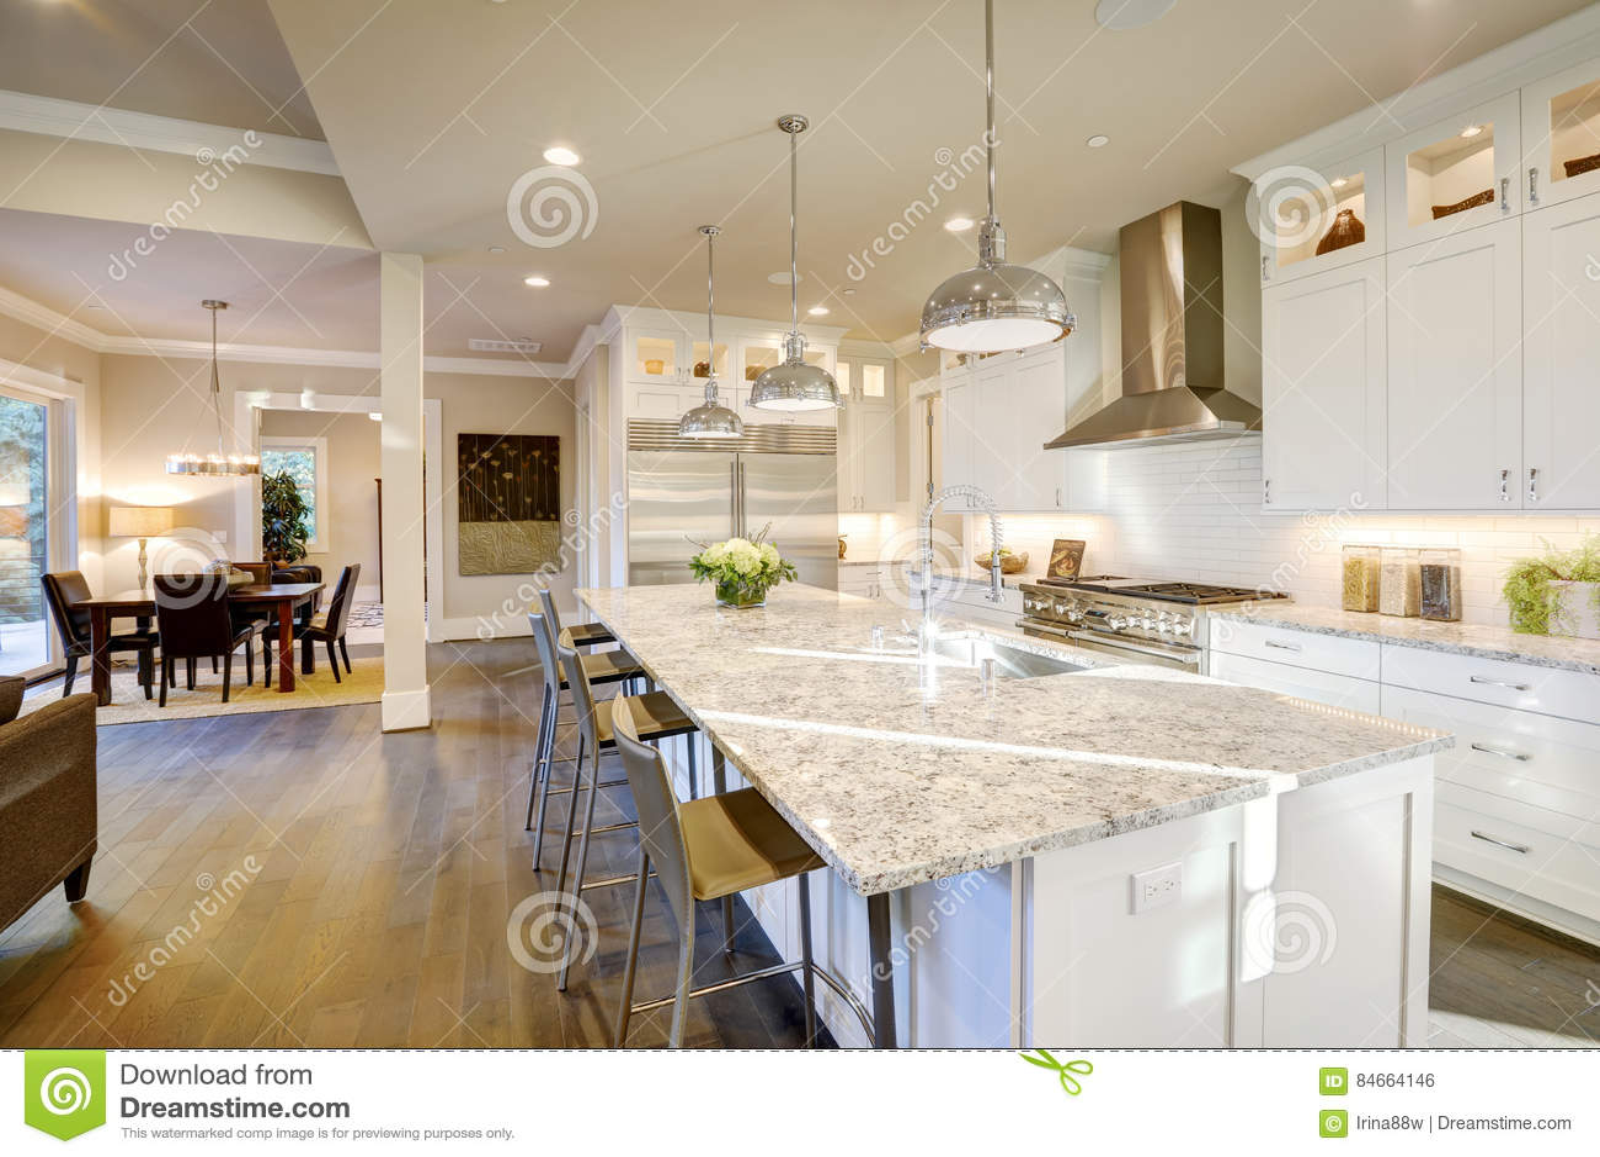 White Kitchen Design In New Luxurious Home Stock Photo Image Of Granite Shiny 84664146